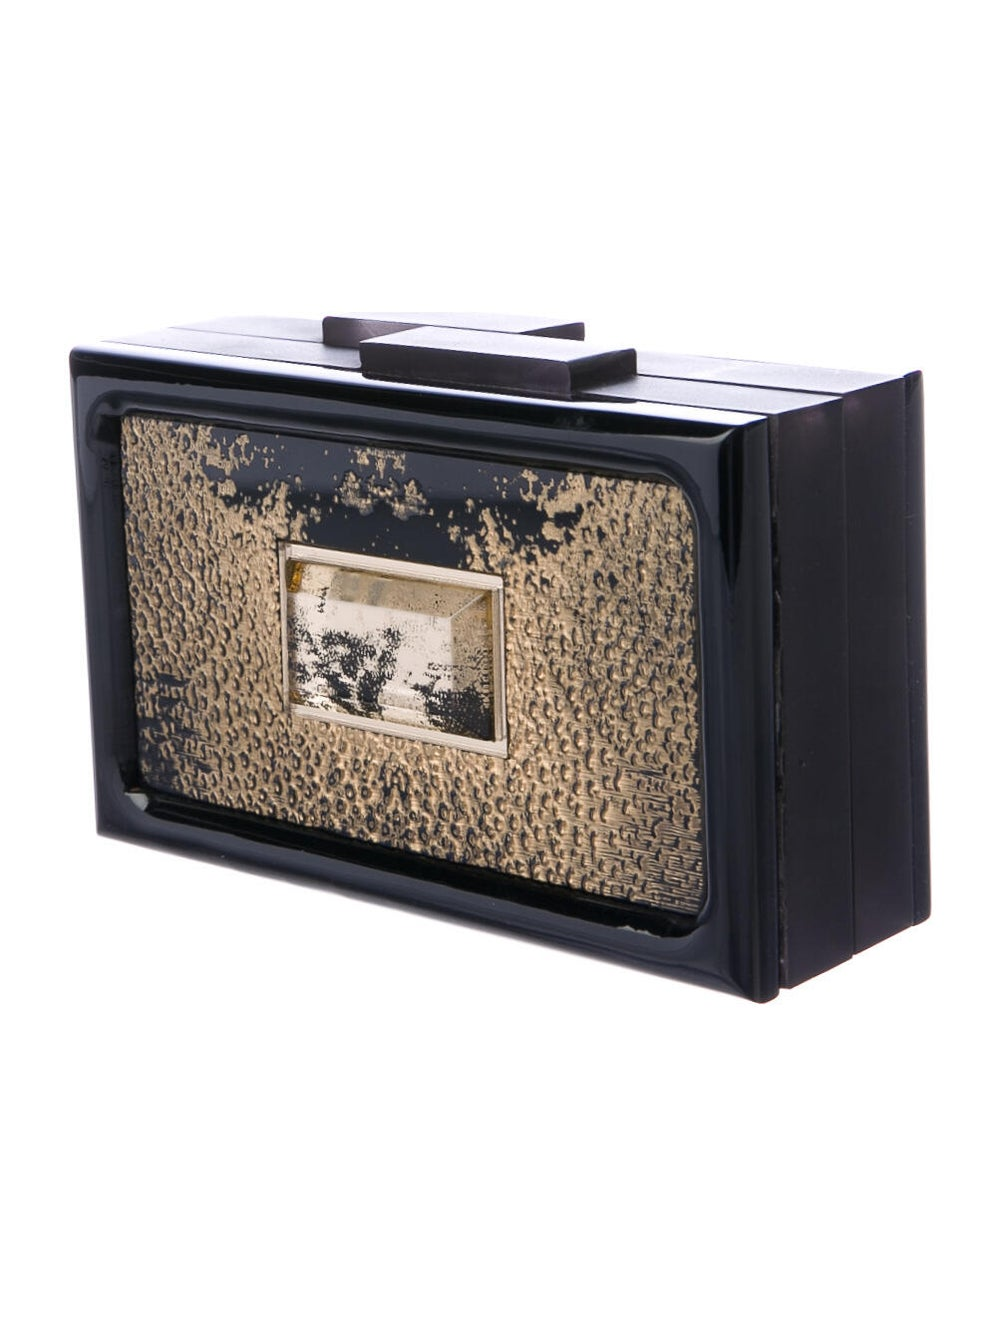 Rauwolf Metallic Box Clutch Black - image 3